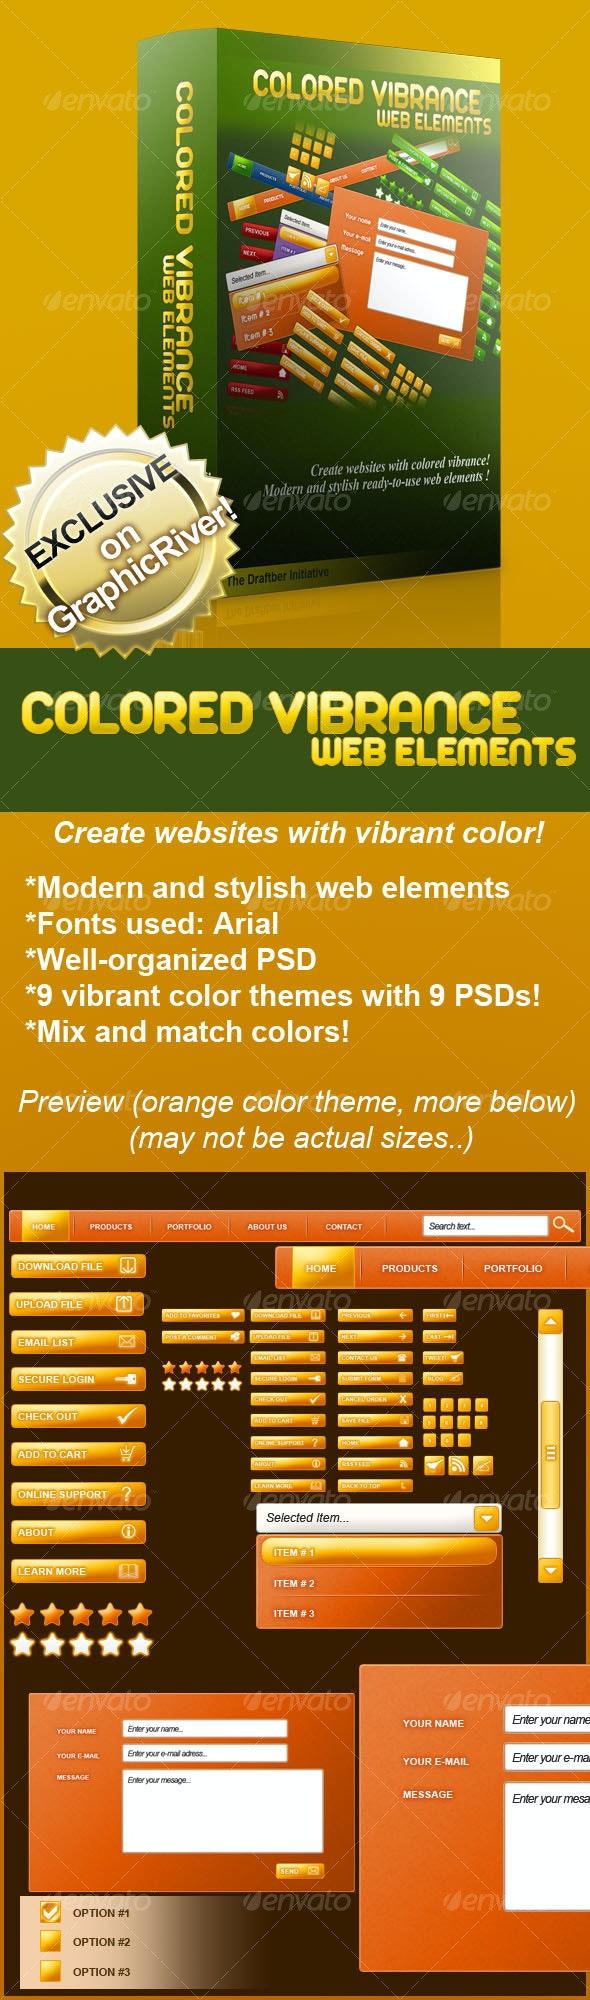 Colored Vibrance Web Elements - Web Elements